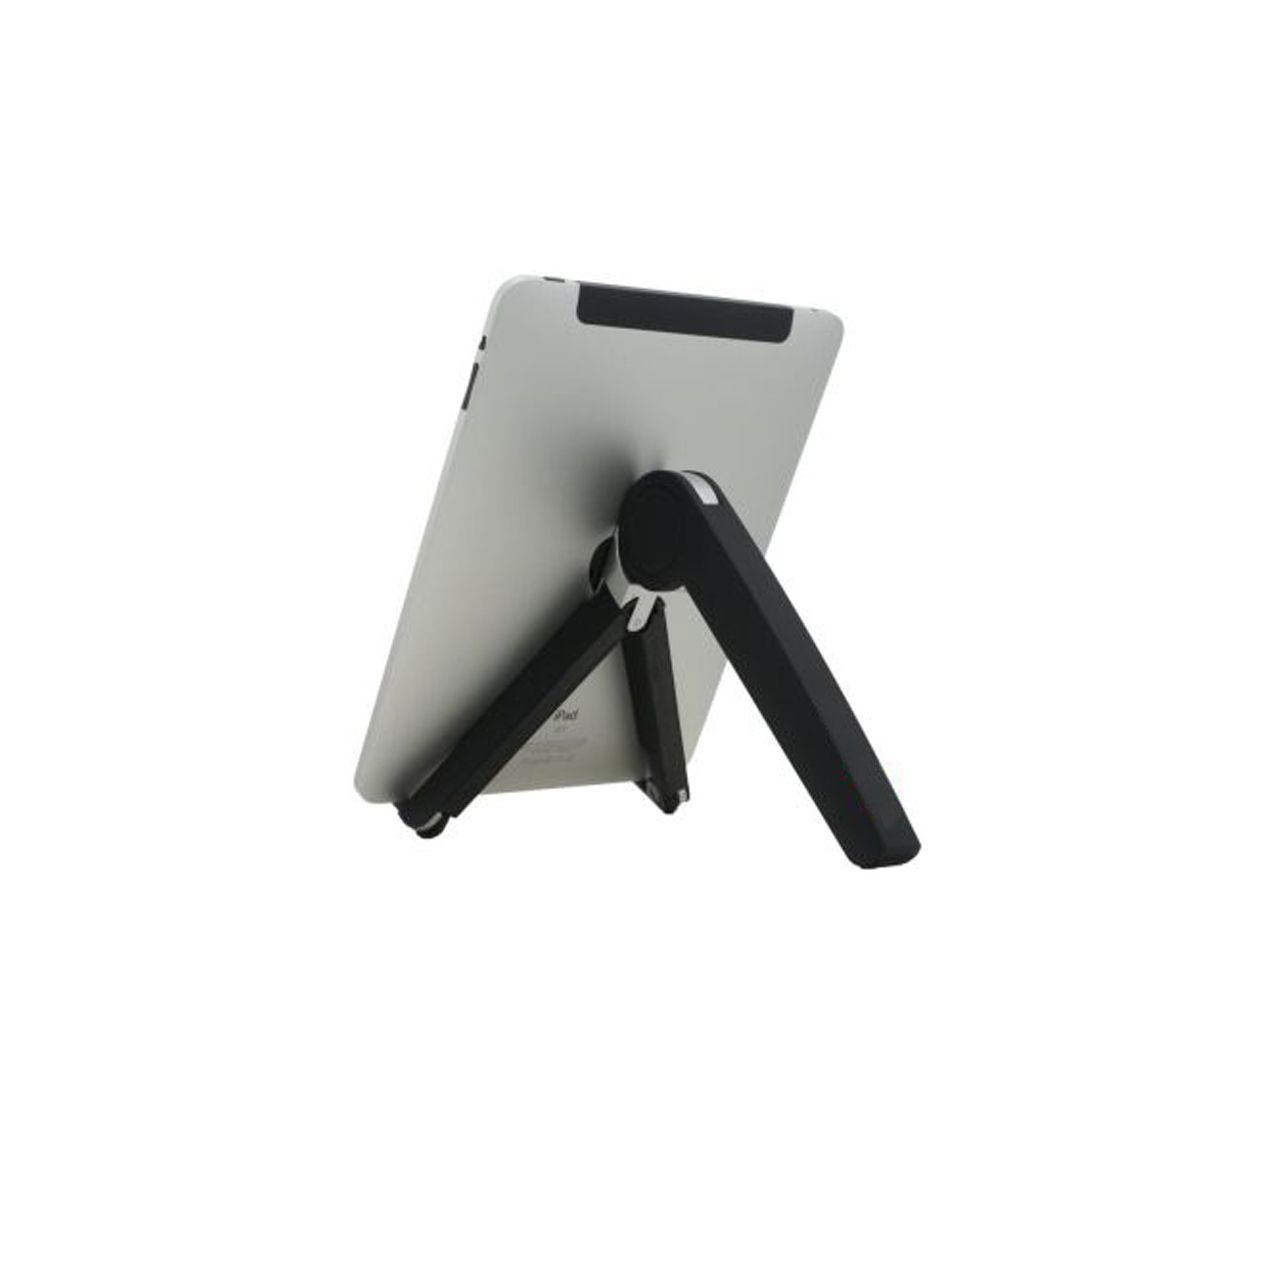 I-pad-ipad-houder-cricket-laptophouder-erkacrw01_0000s_0002_achterkant_1